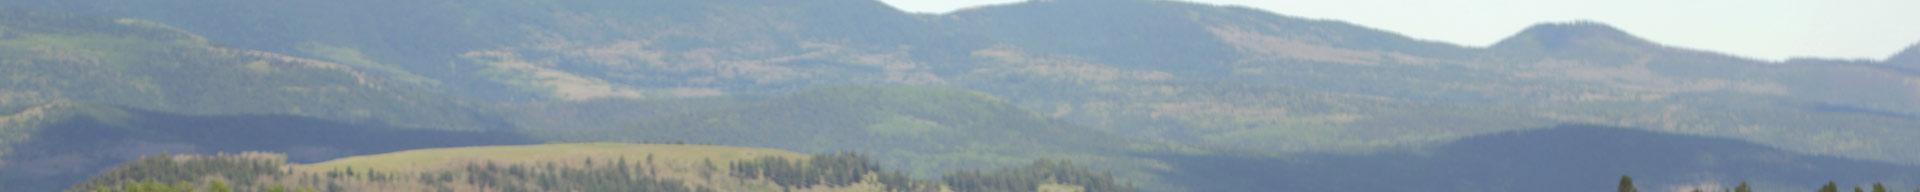 view of grassy mountain plains